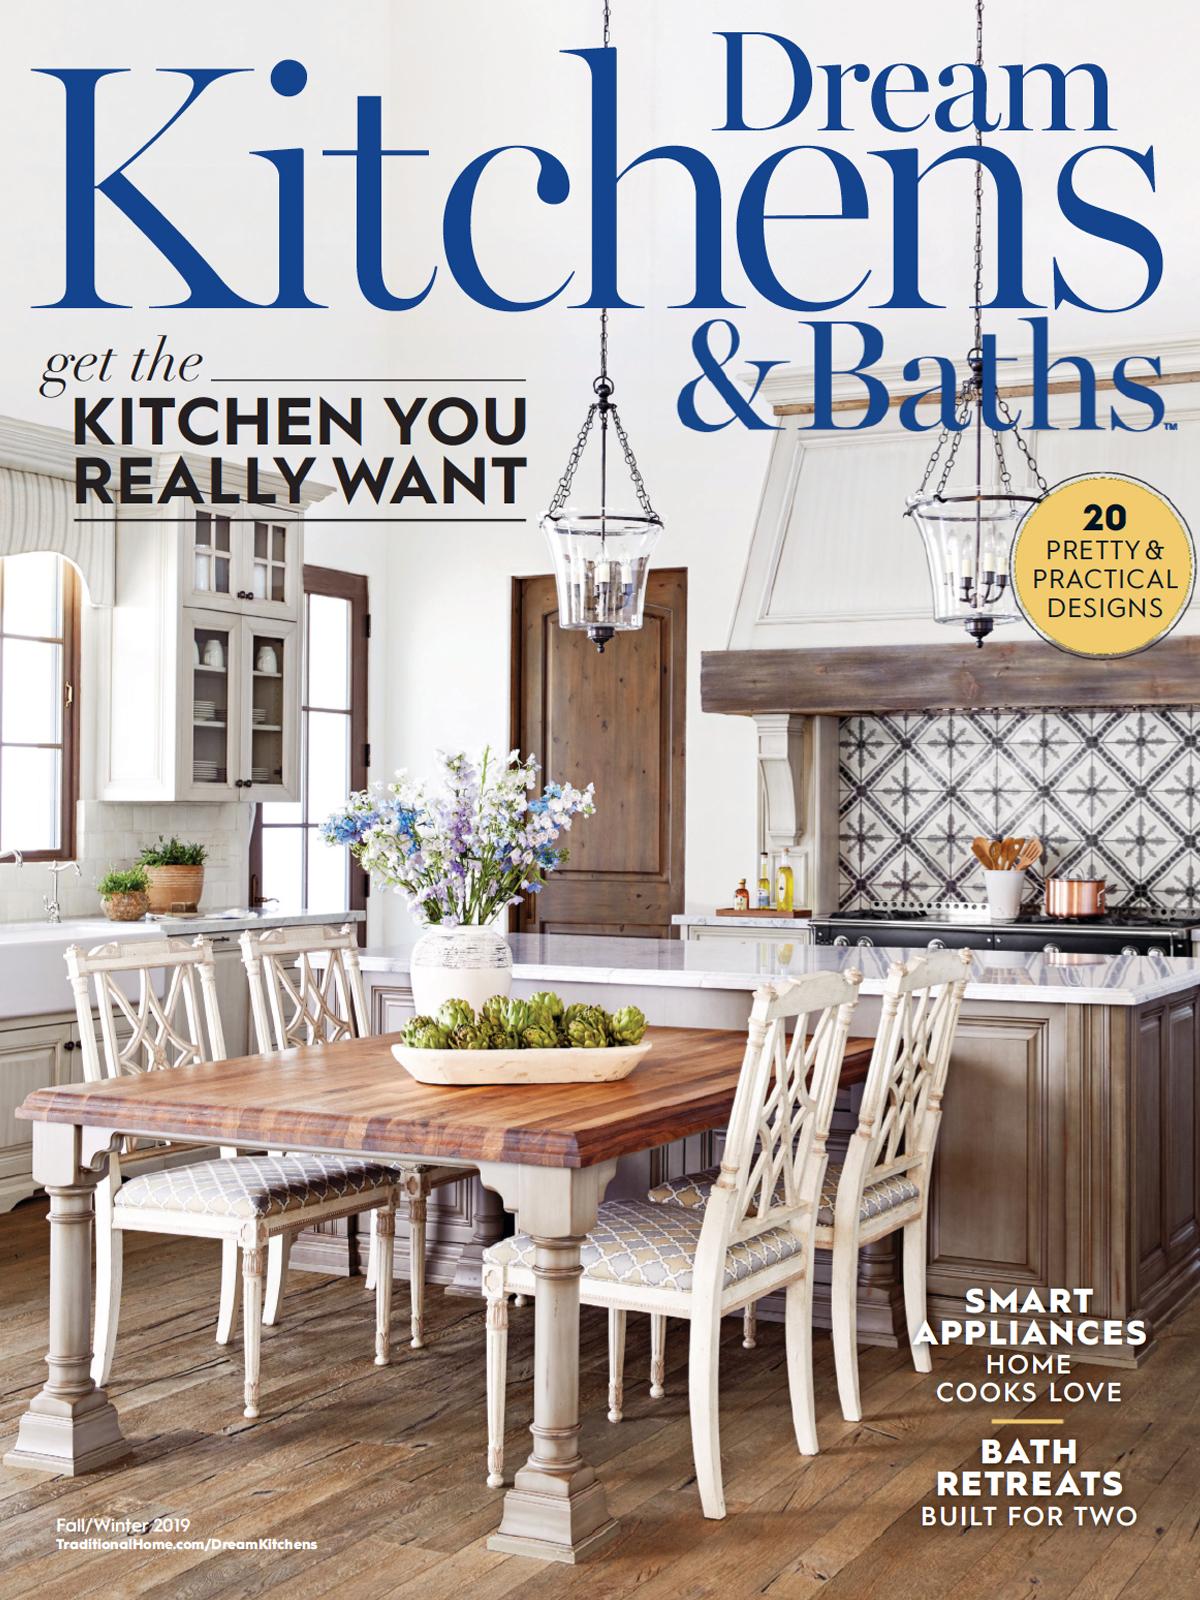 blackband_design_dream_kitchens_baths_fall_2019-cover